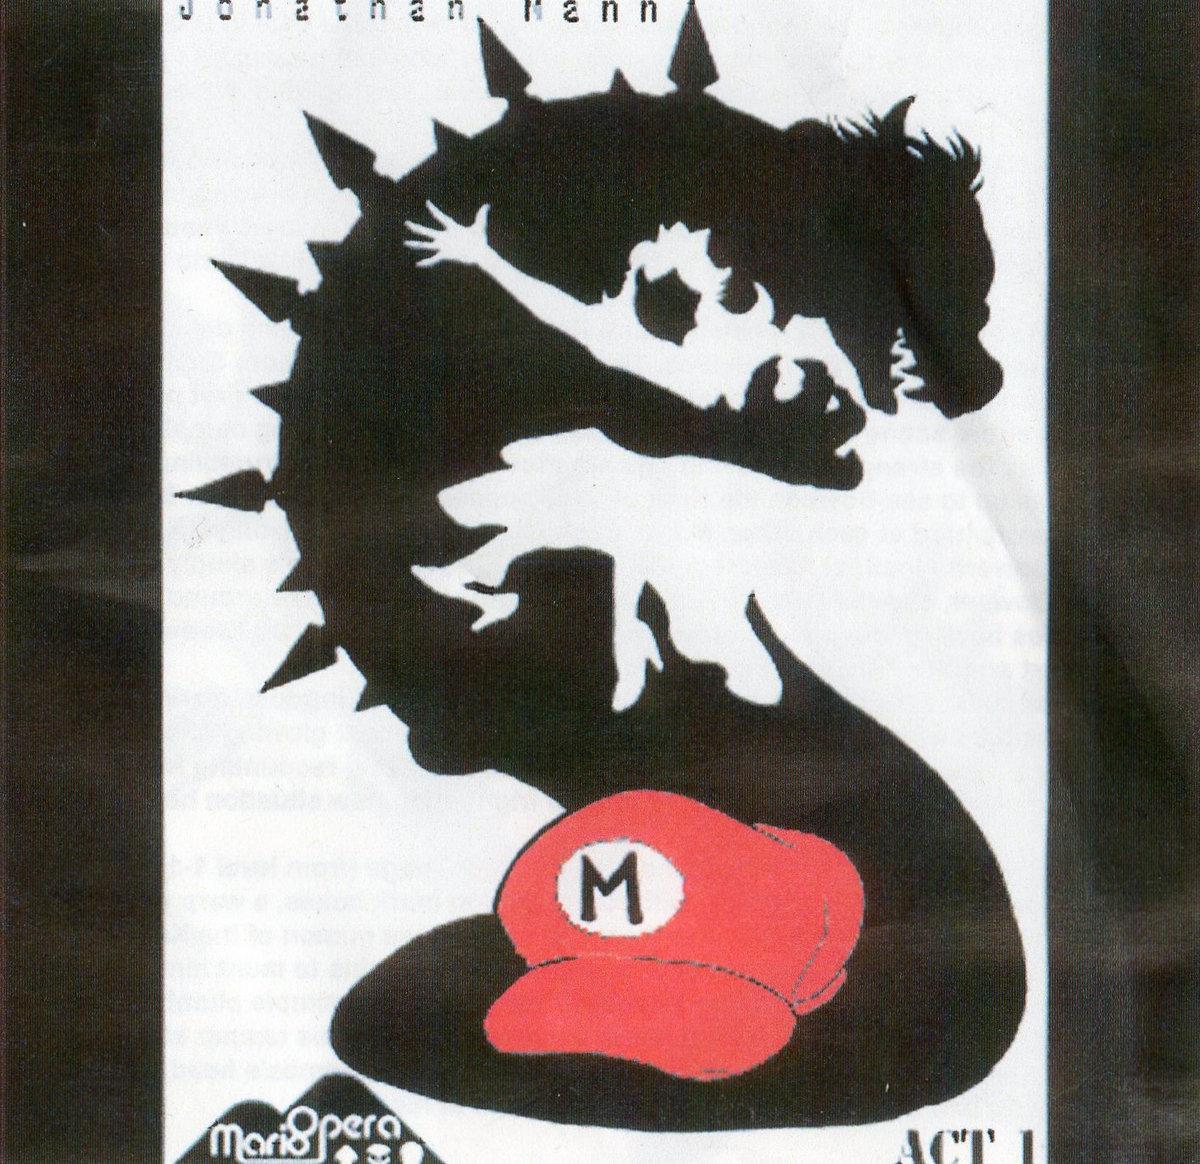 The Mario Opera: Act 1 (demos) | Jonathan Mann